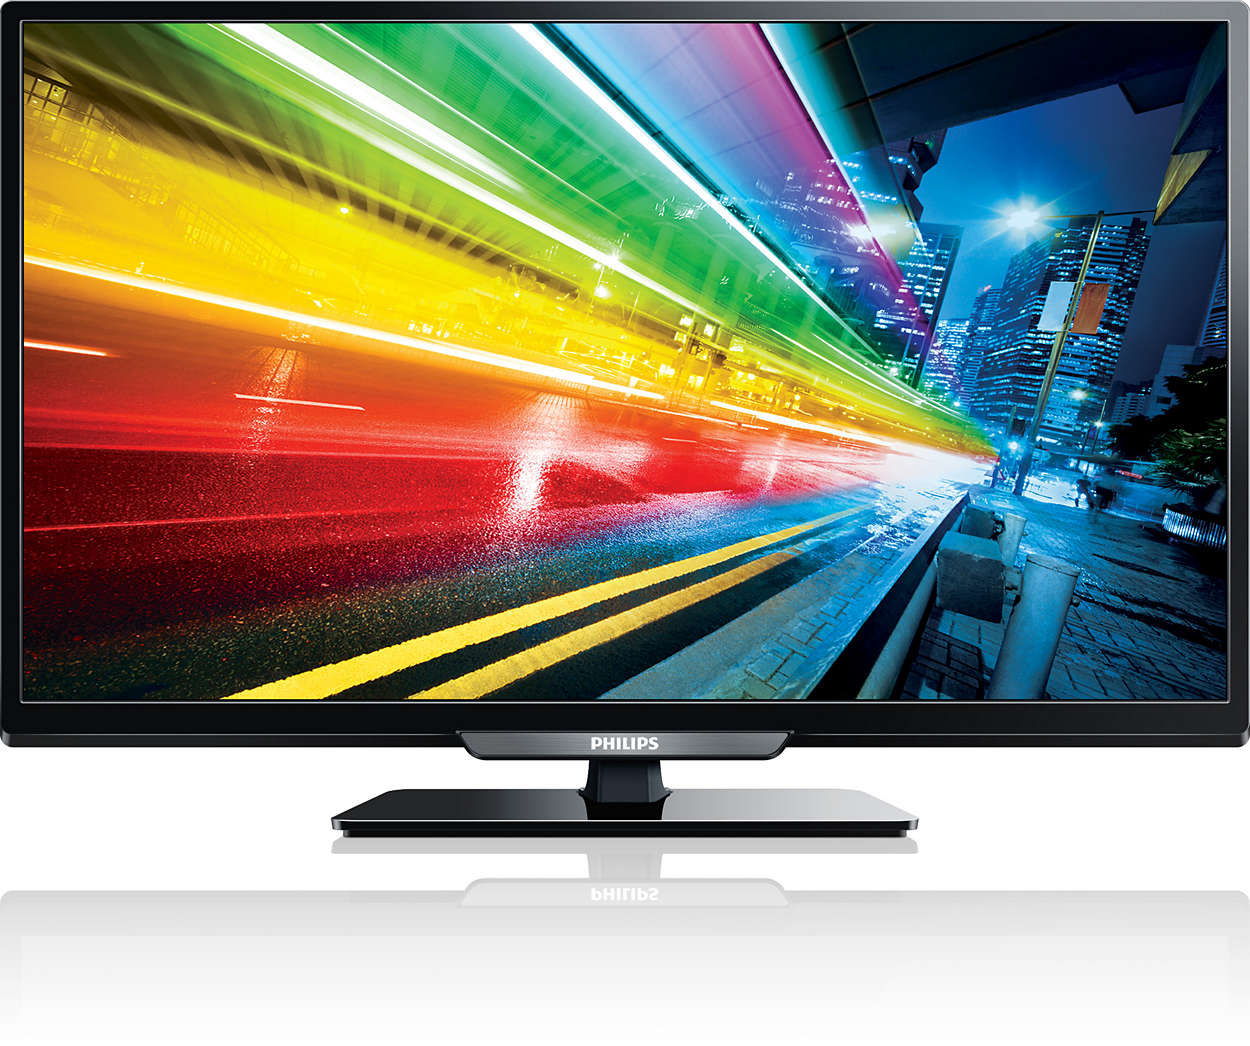 televisor led lcd serie 4000 32pfl4509 f8 philips. Black Bedroom Furniture Sets. Home Design Ideas